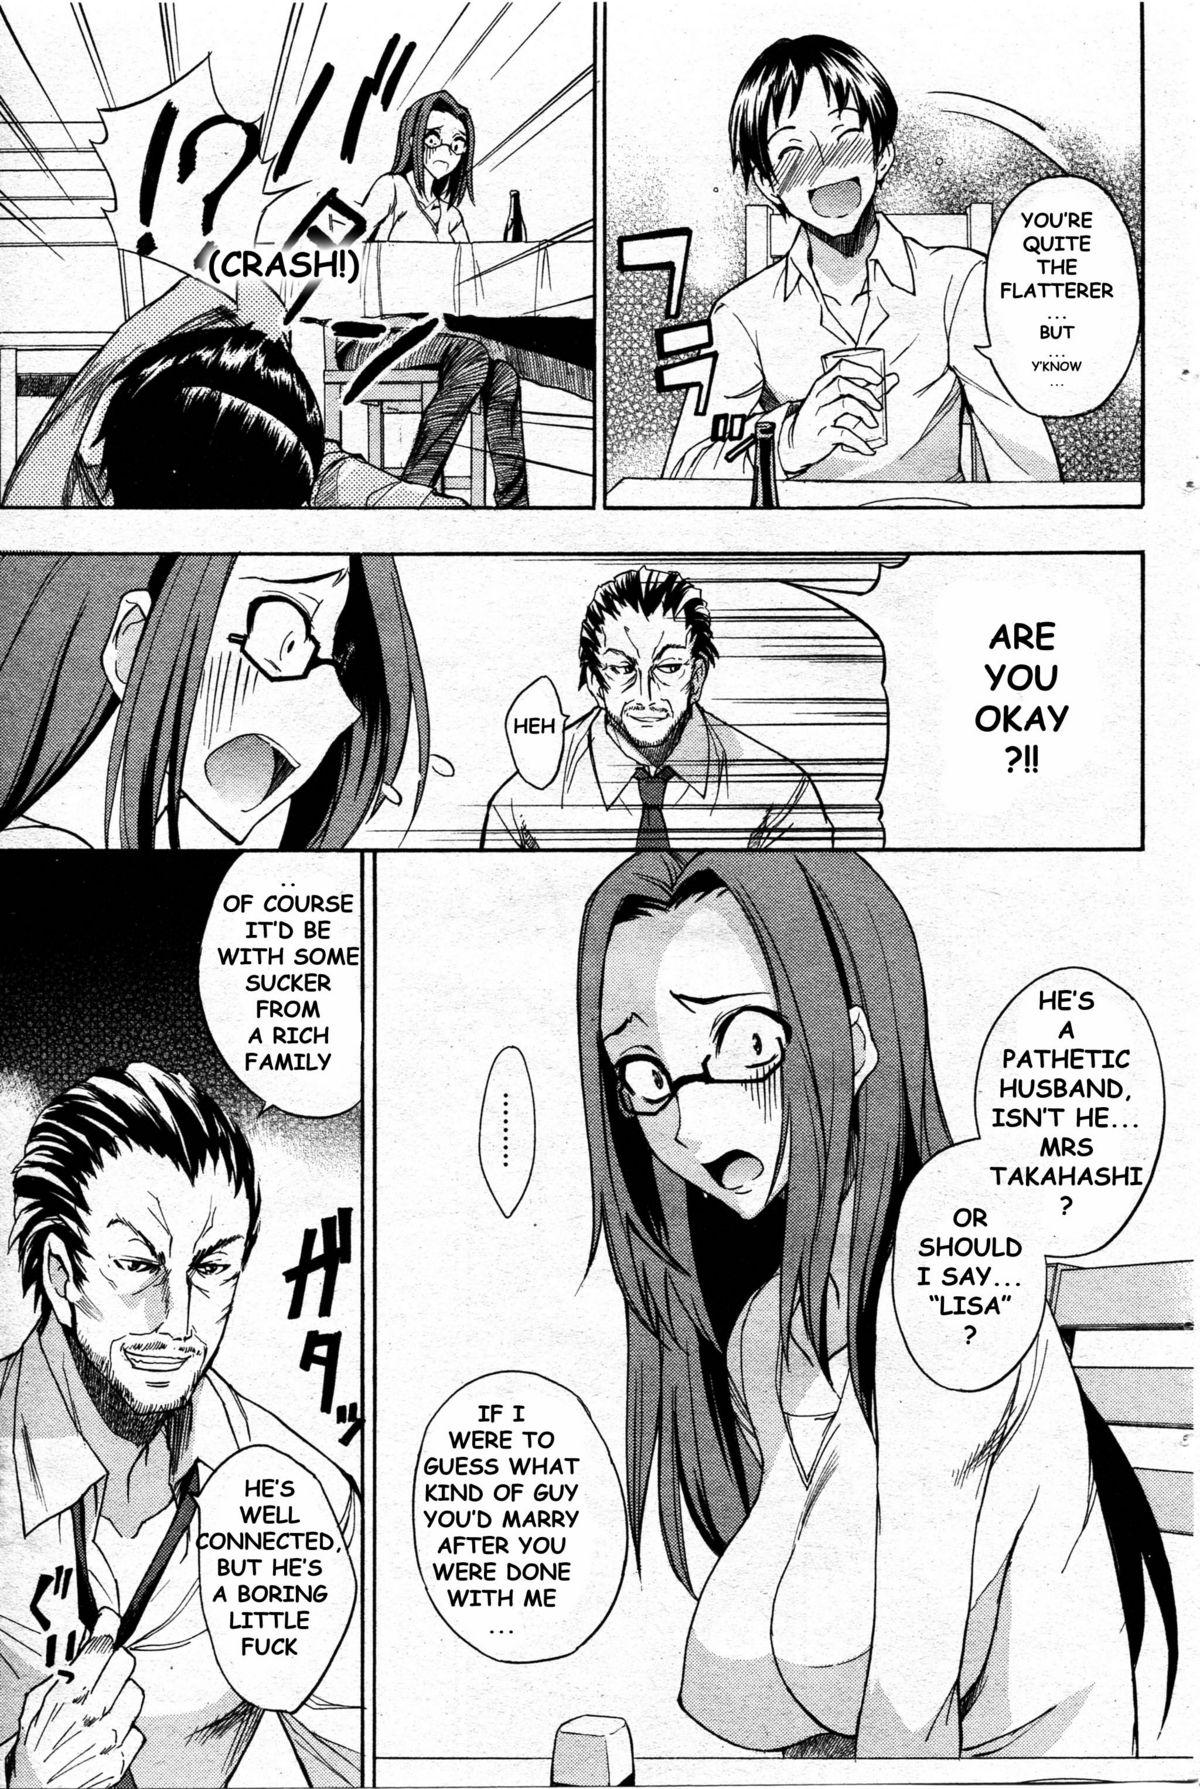 Okusan no Himitsu | A Wife's Secret 4